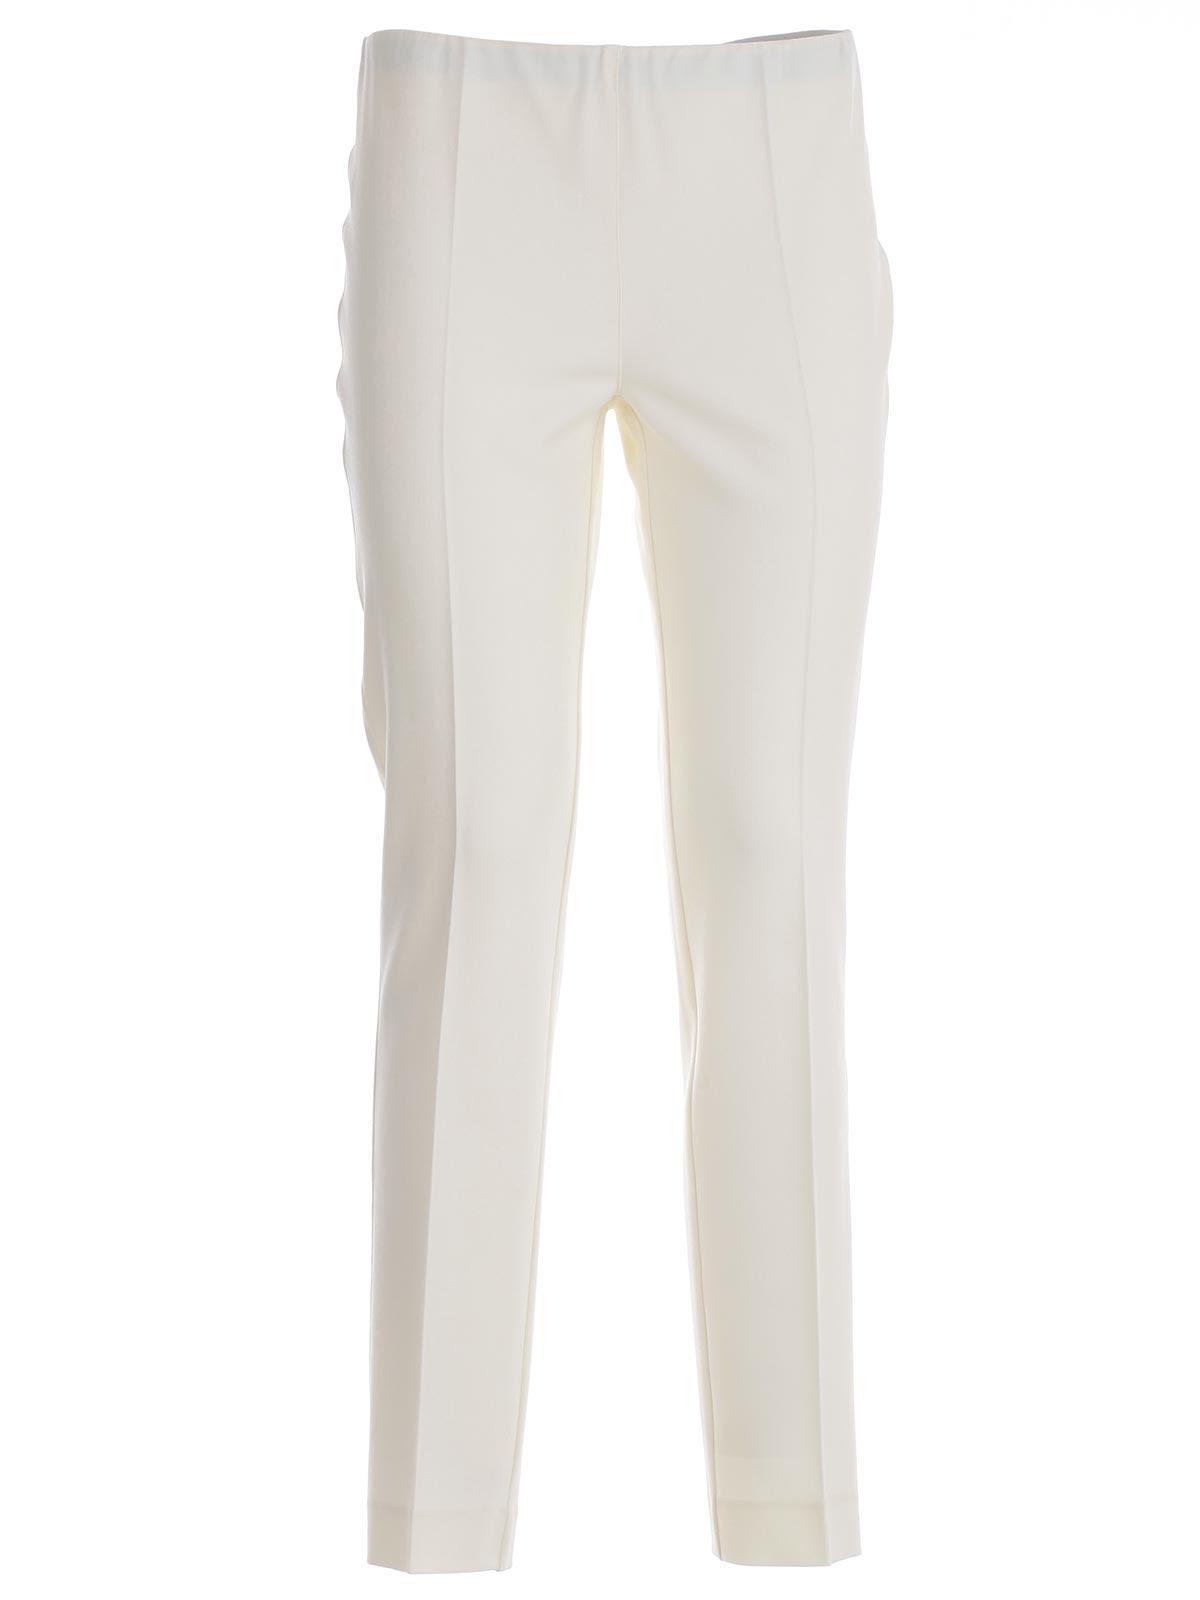 Pantalone Elastico Vita